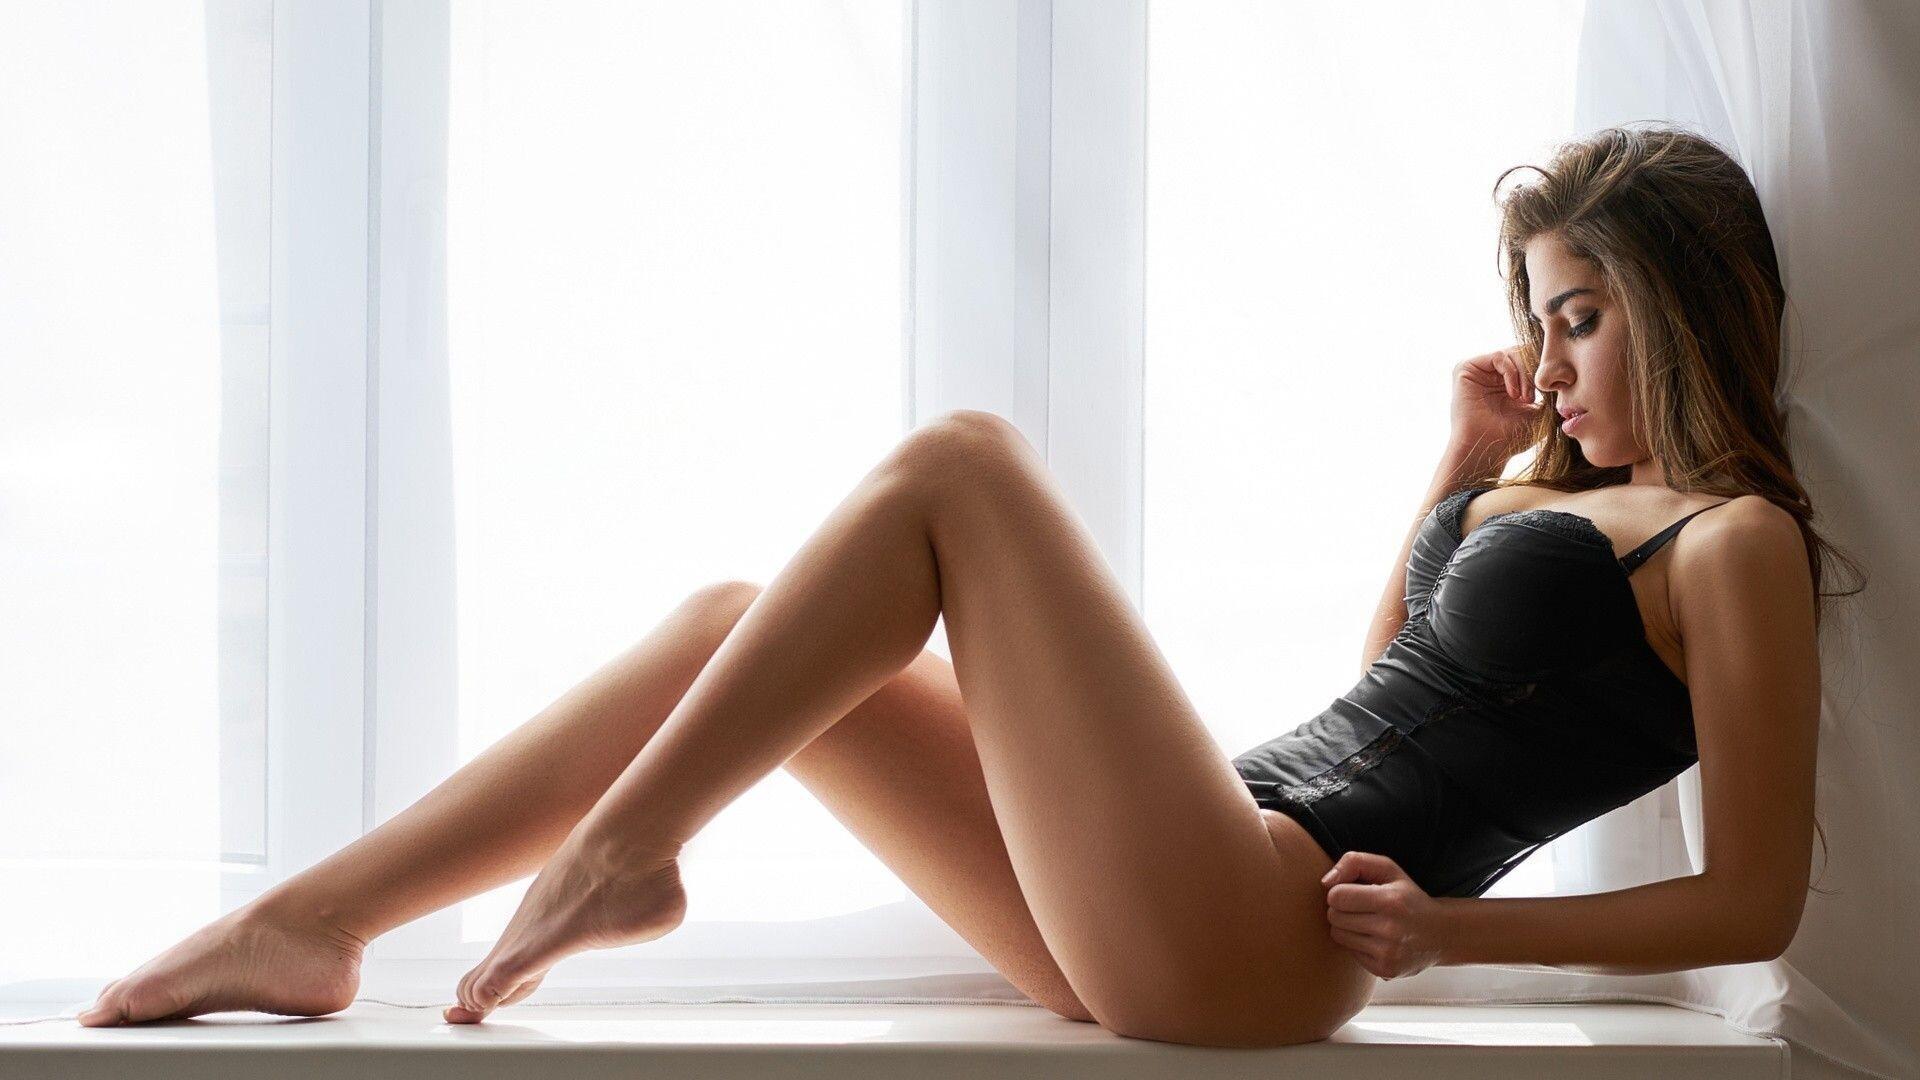 Masturbation with leggy hot elena koshka whos using dildo while outdoors